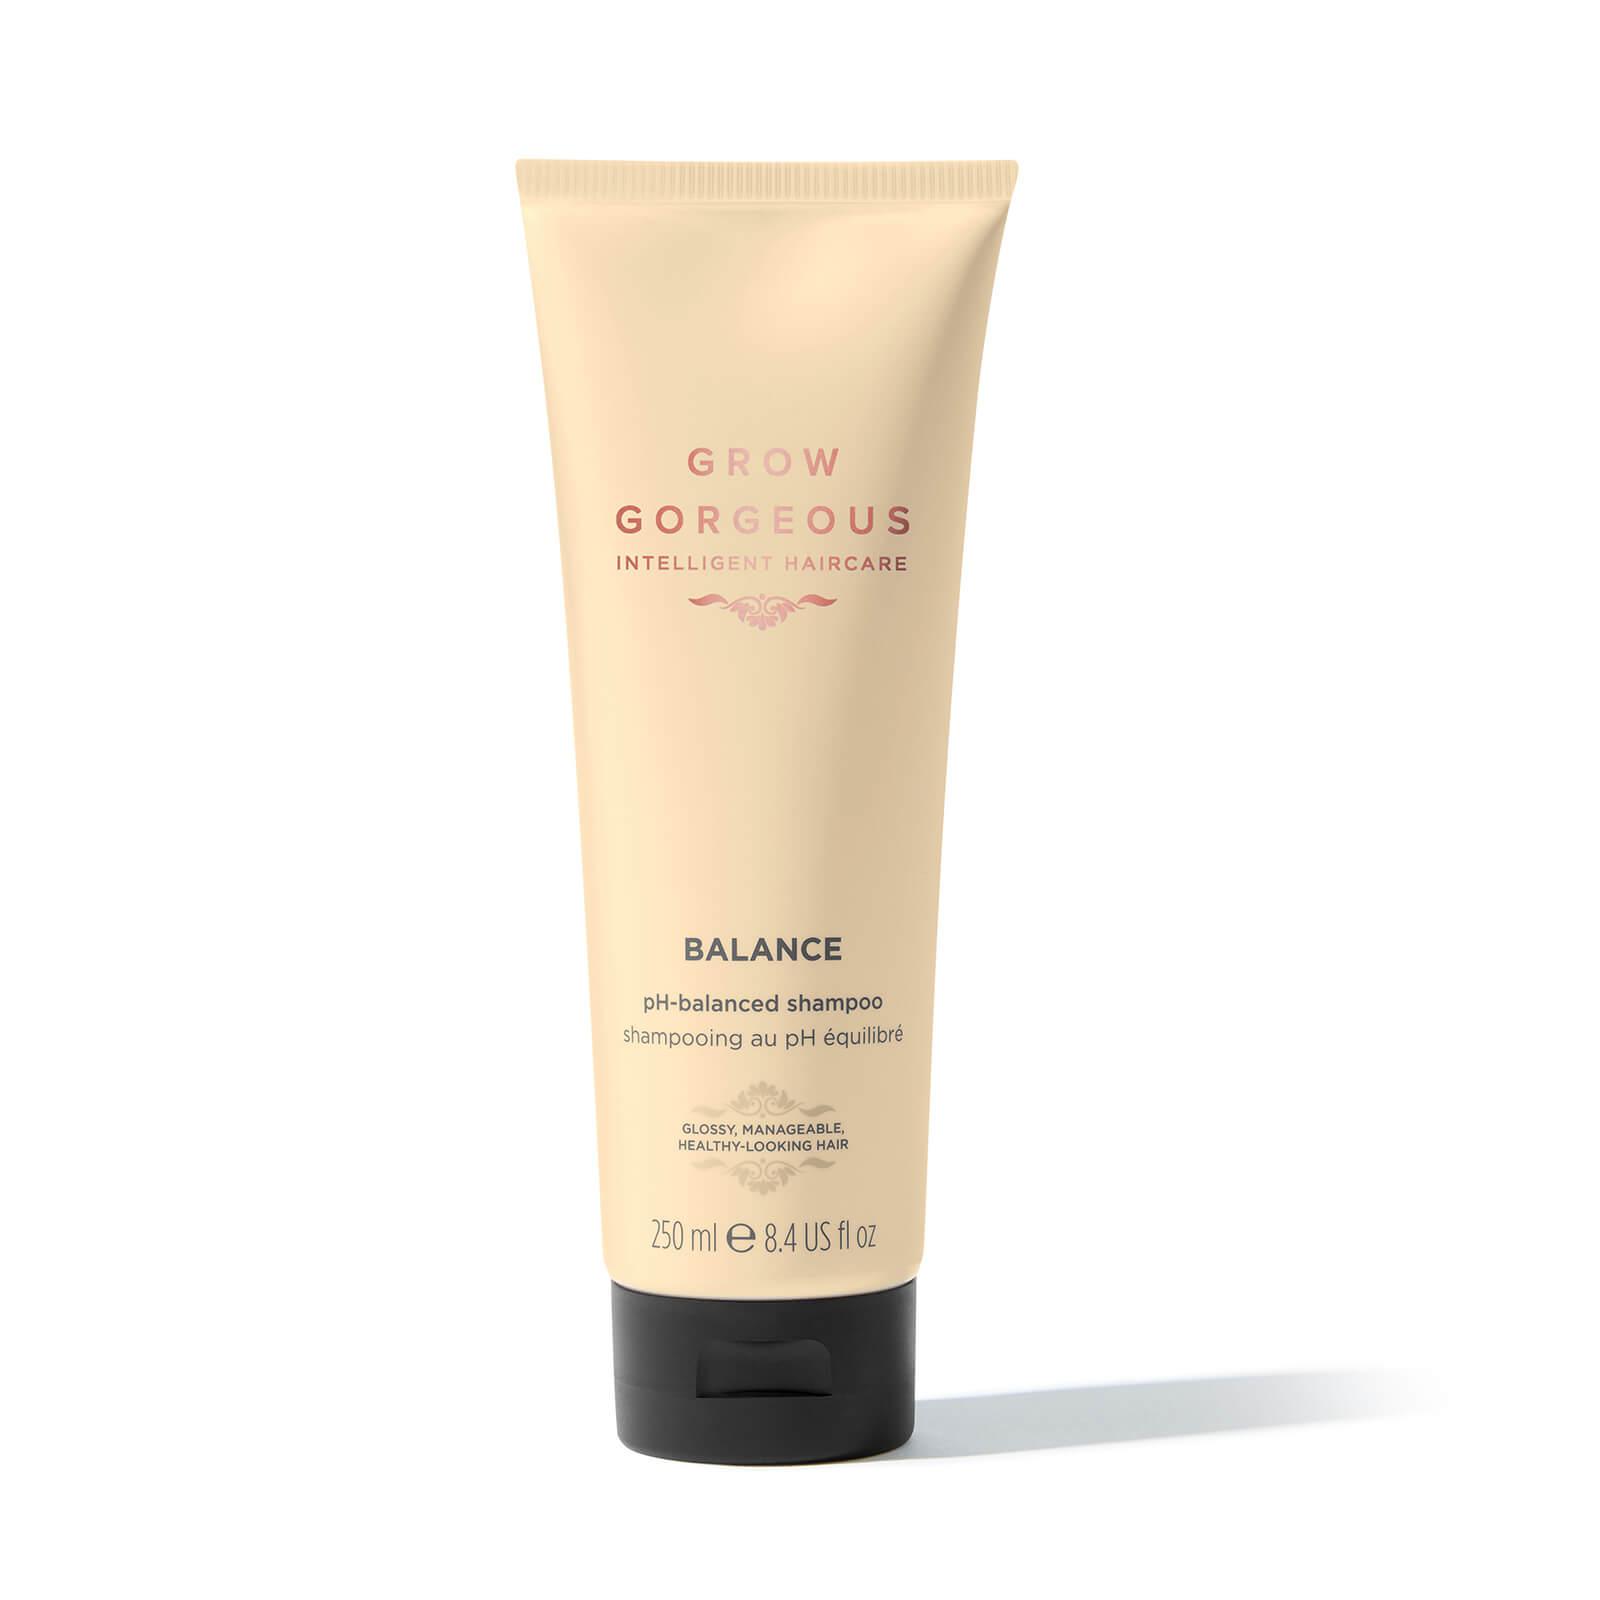 Купить Grow Gorgeous Balance pH-Balanced Shampoo 250ml